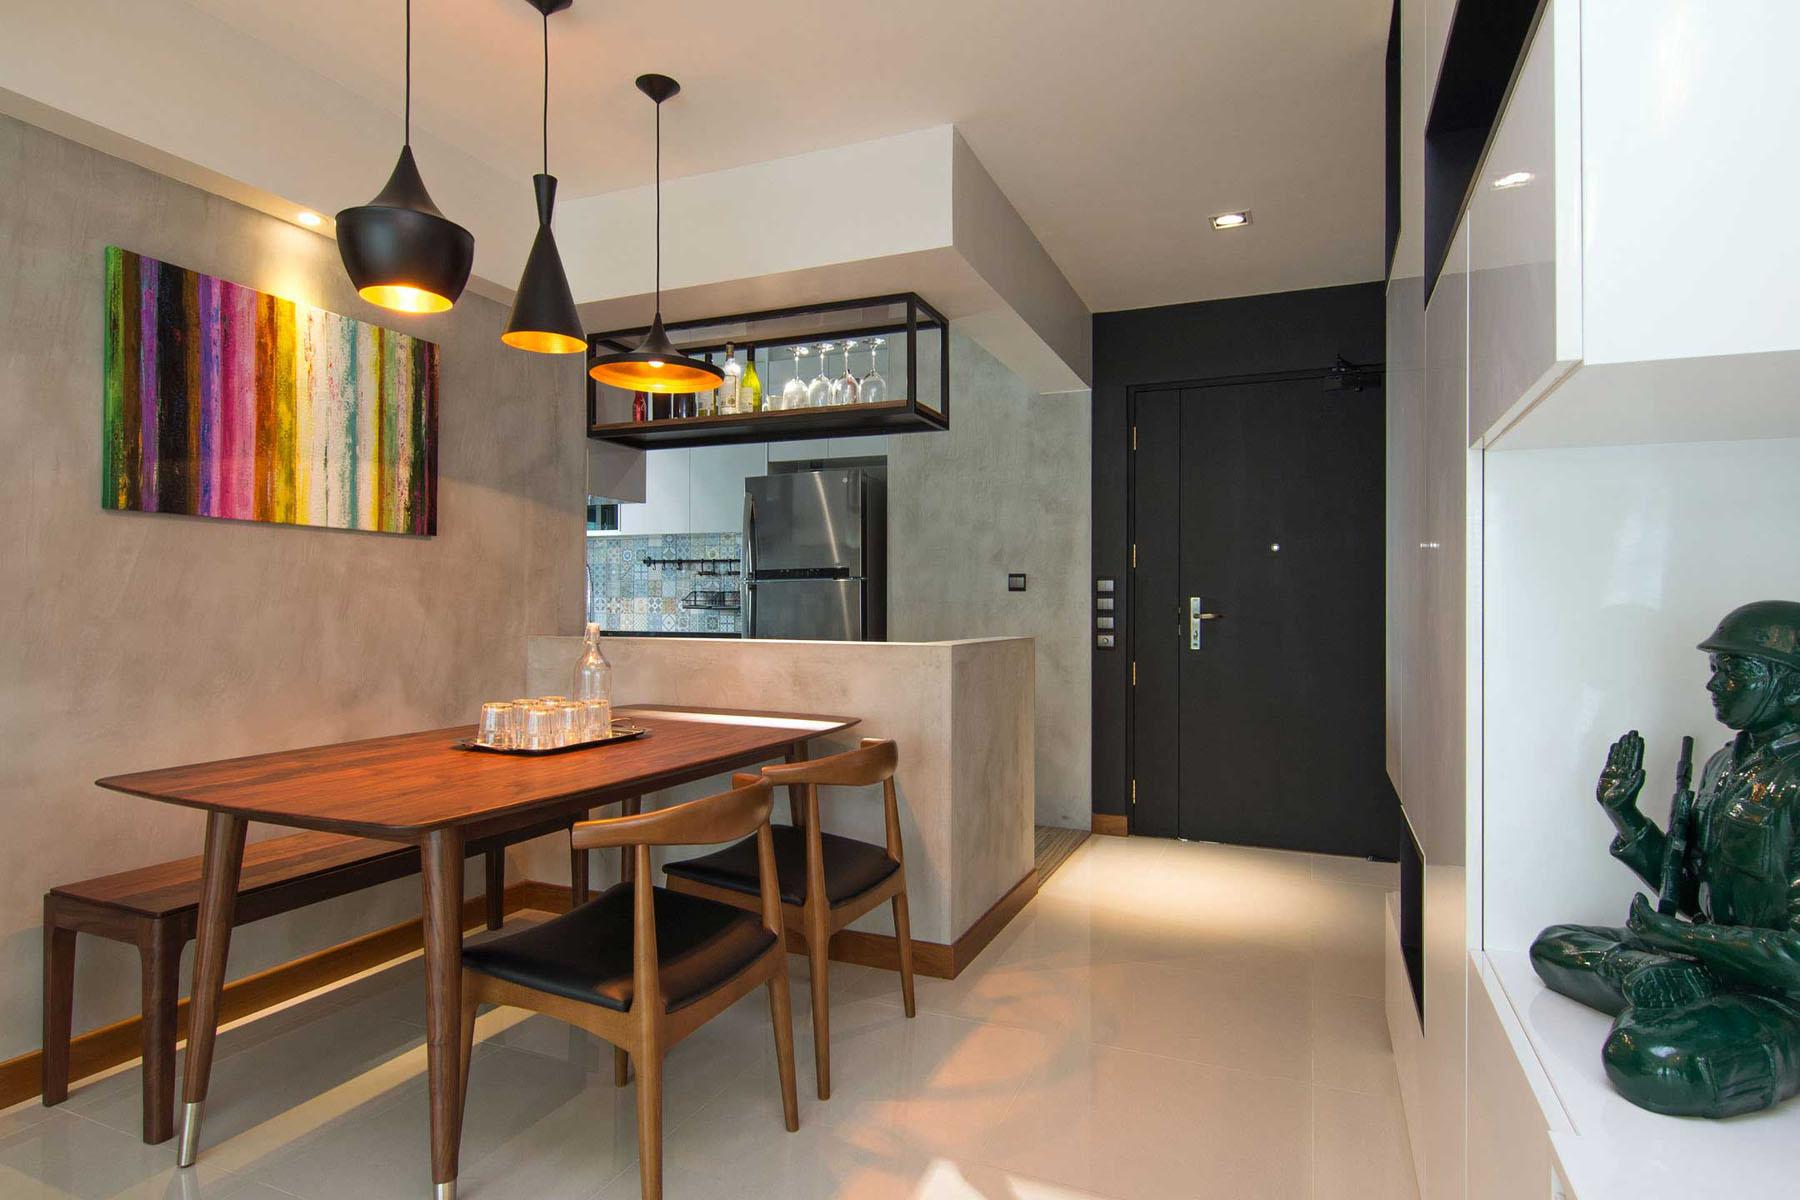 Cozy Apartment In Singapore With Stylish Elements IDesignArch Interior Design Architecture